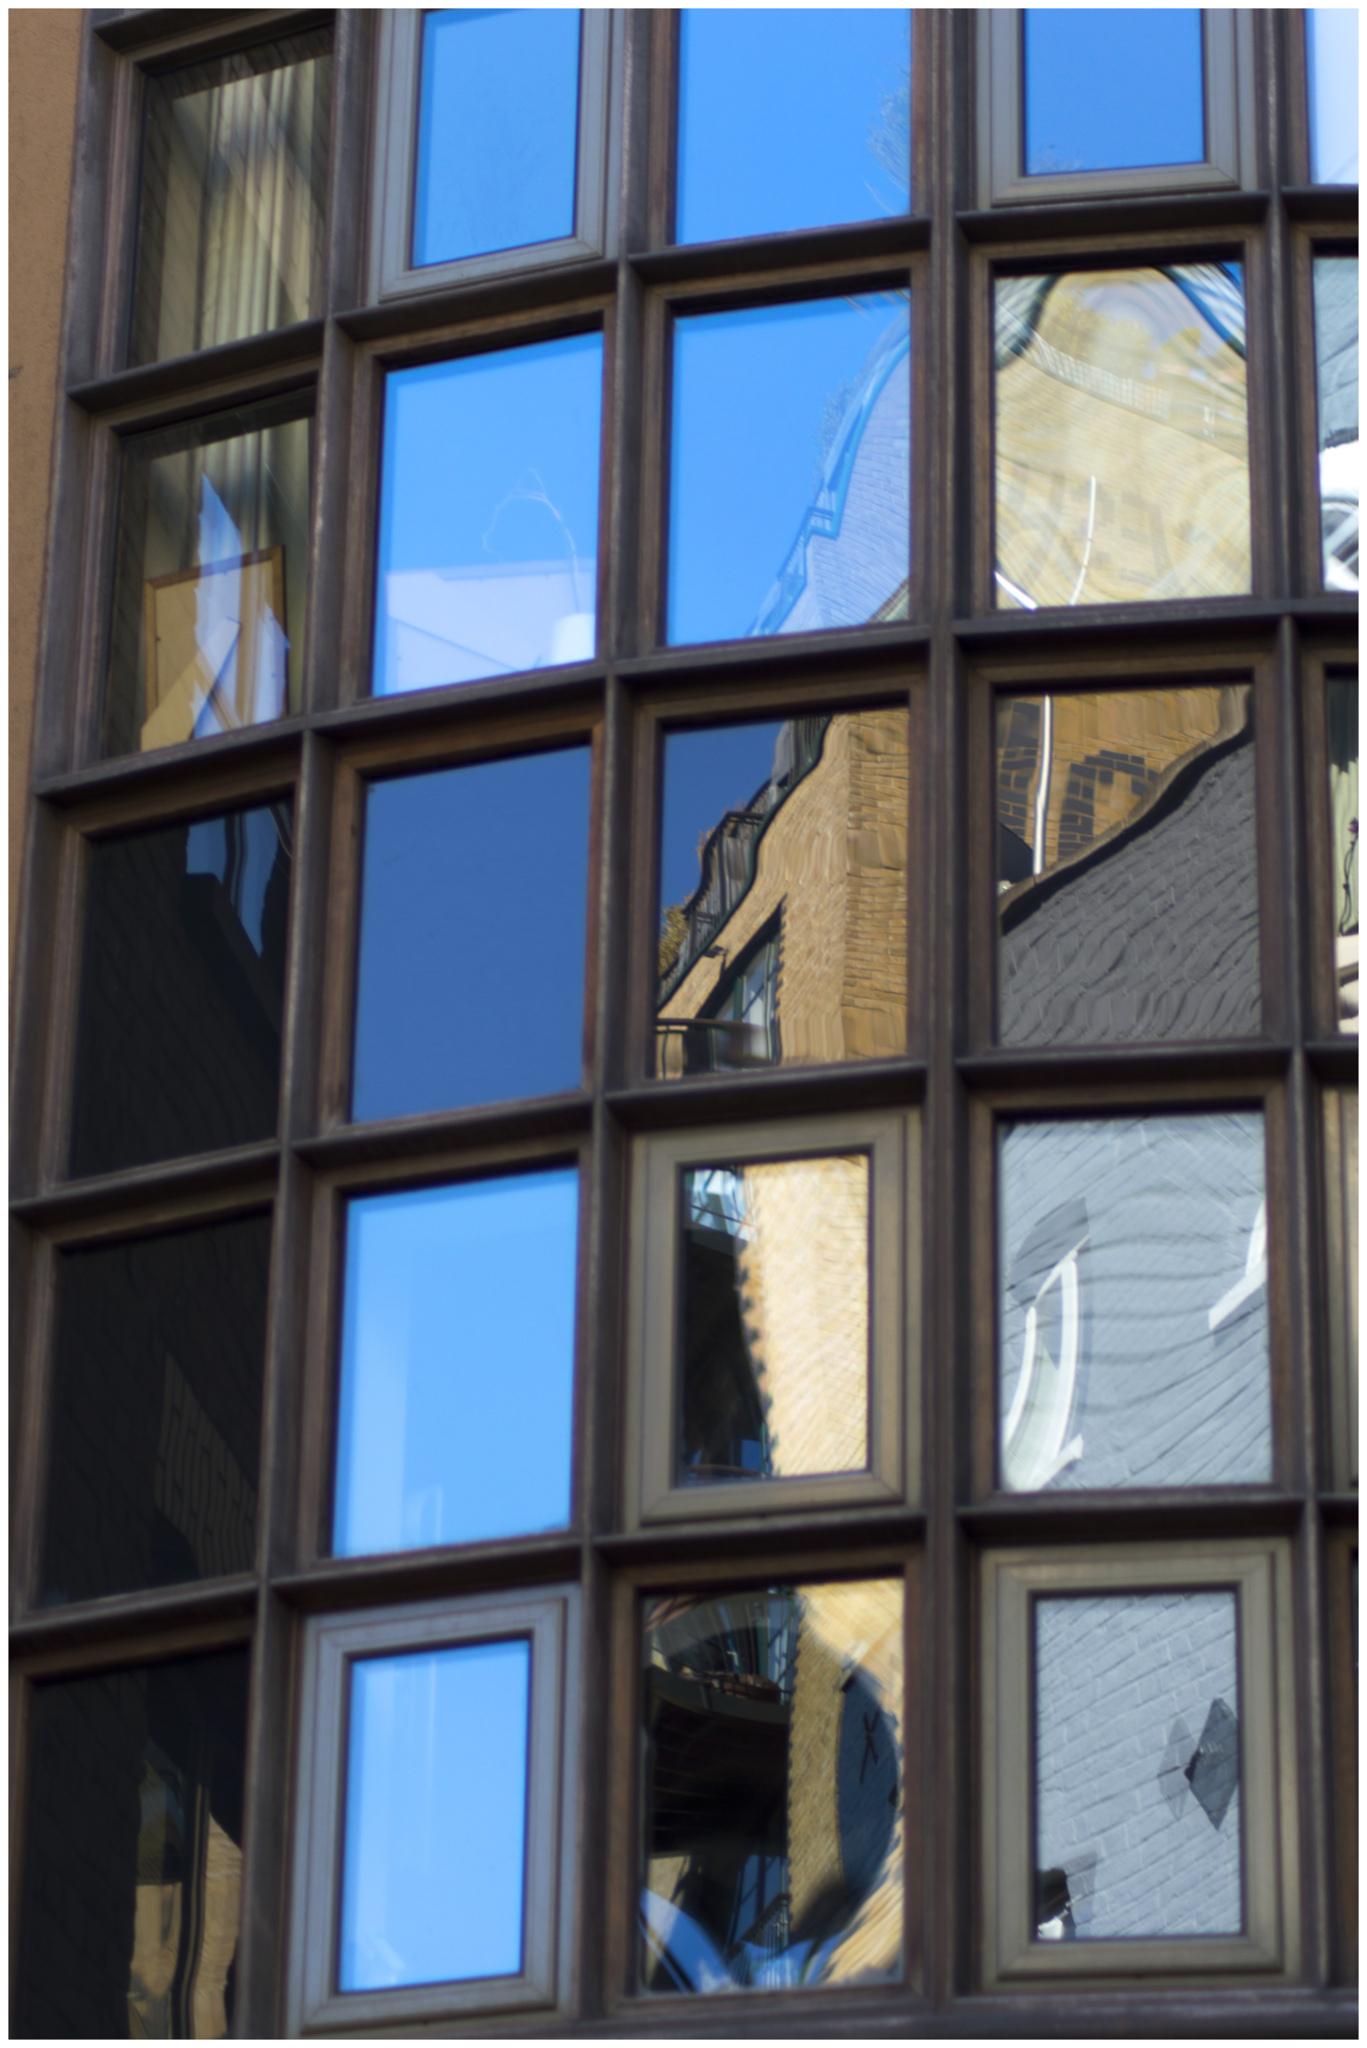 Mosaic Reflections